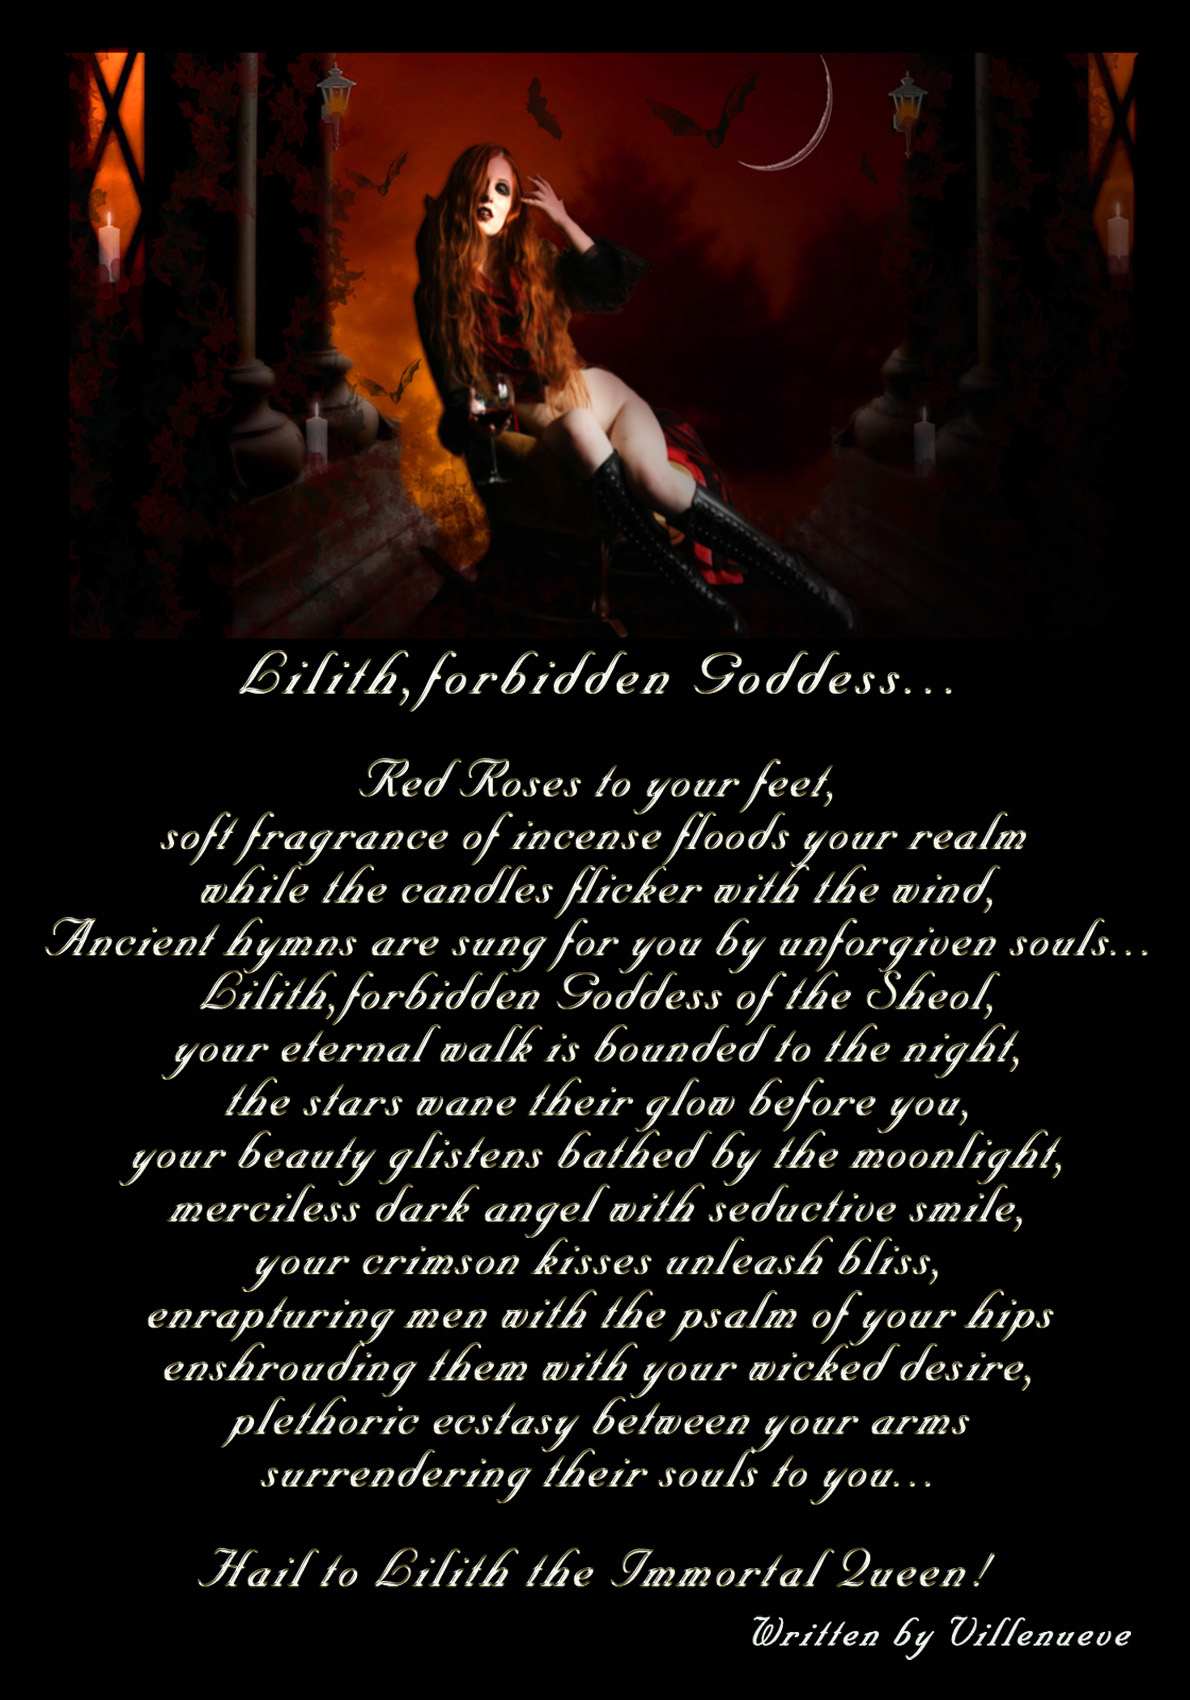 Lilith,forbidden Goddess-VP by Villenueve